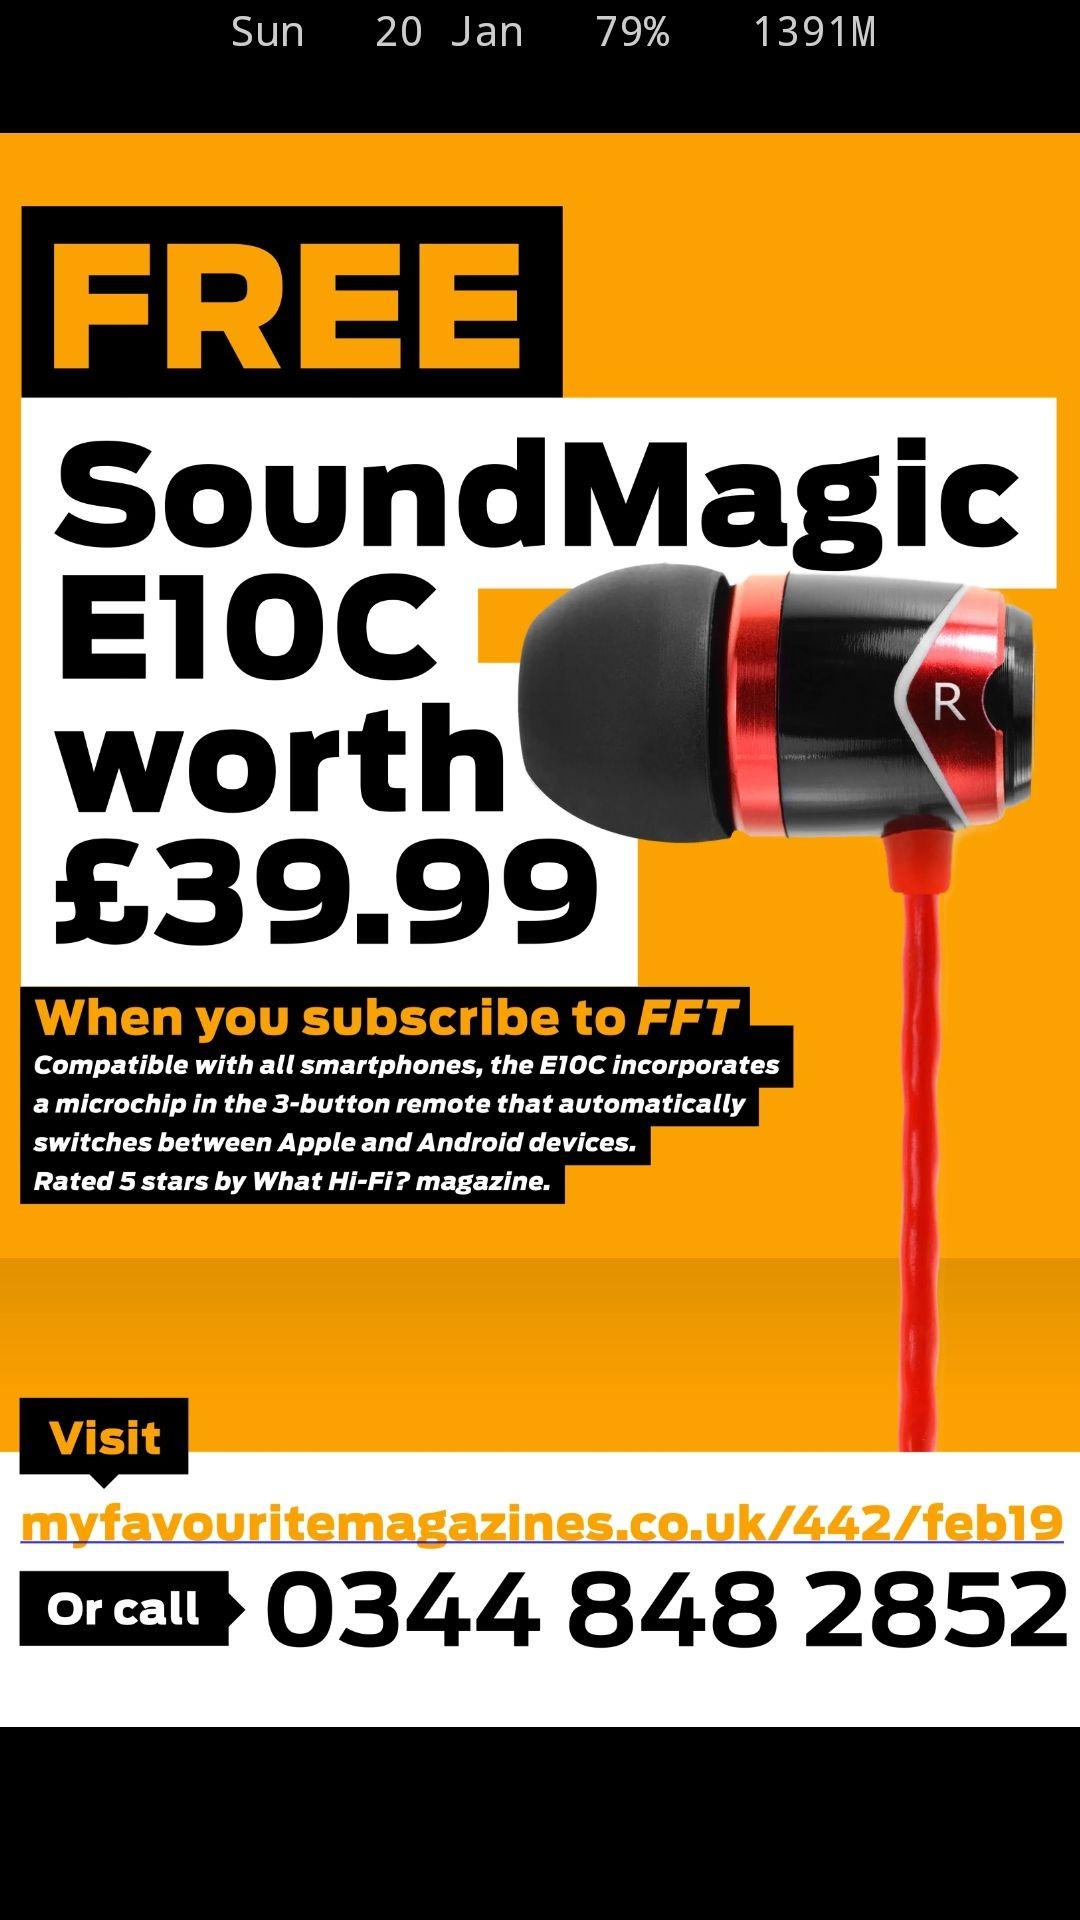 6 months subscription to Four Four Two football magazine - £19.99 @ My Favourite Magazine - Get SoundMagic E10C earphones worth £39.99